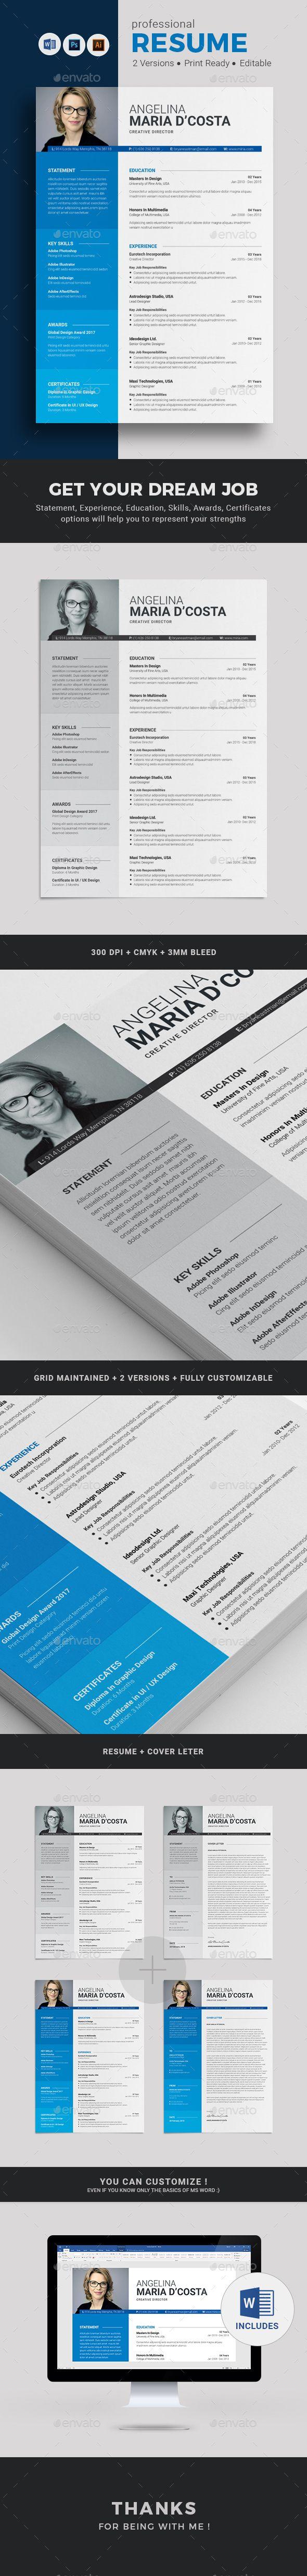 Senior Graphic Designer Resume A4 Resume Blue Resume Career Resume Clean Resume Color Resume .